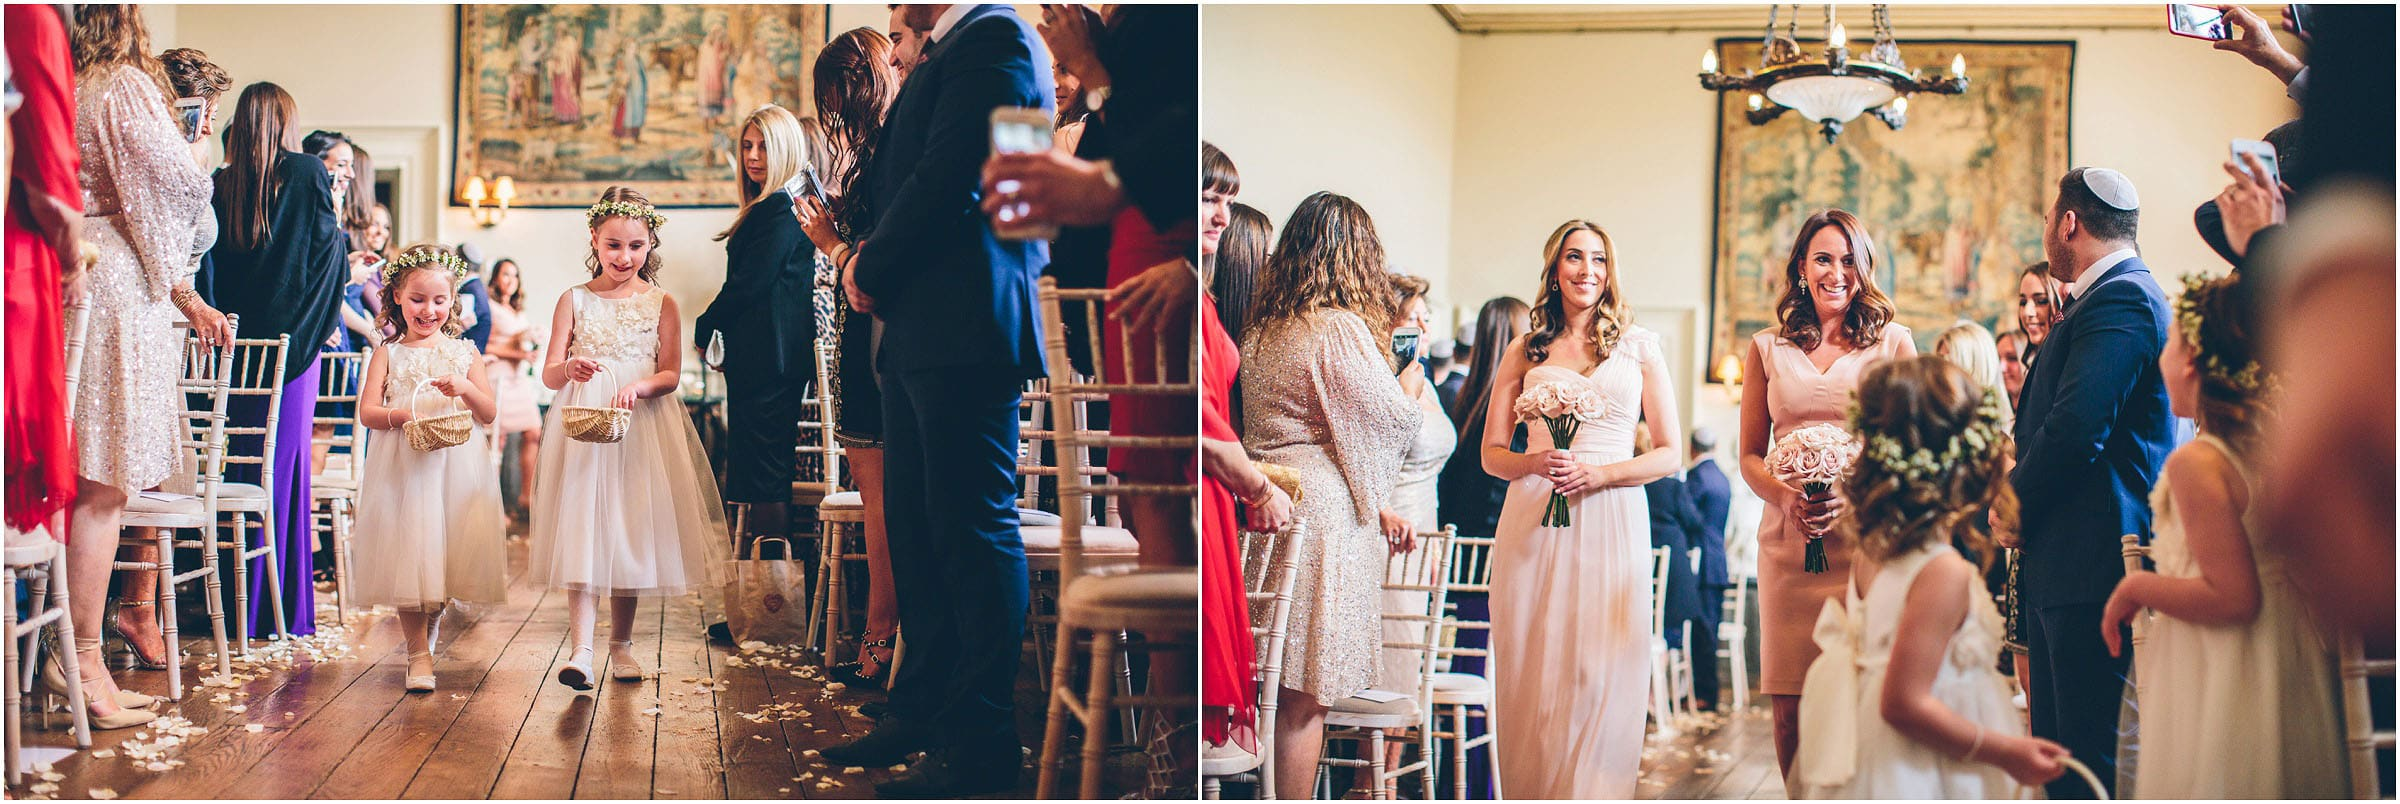 Elmore_Court_Wedding_Photography_0042